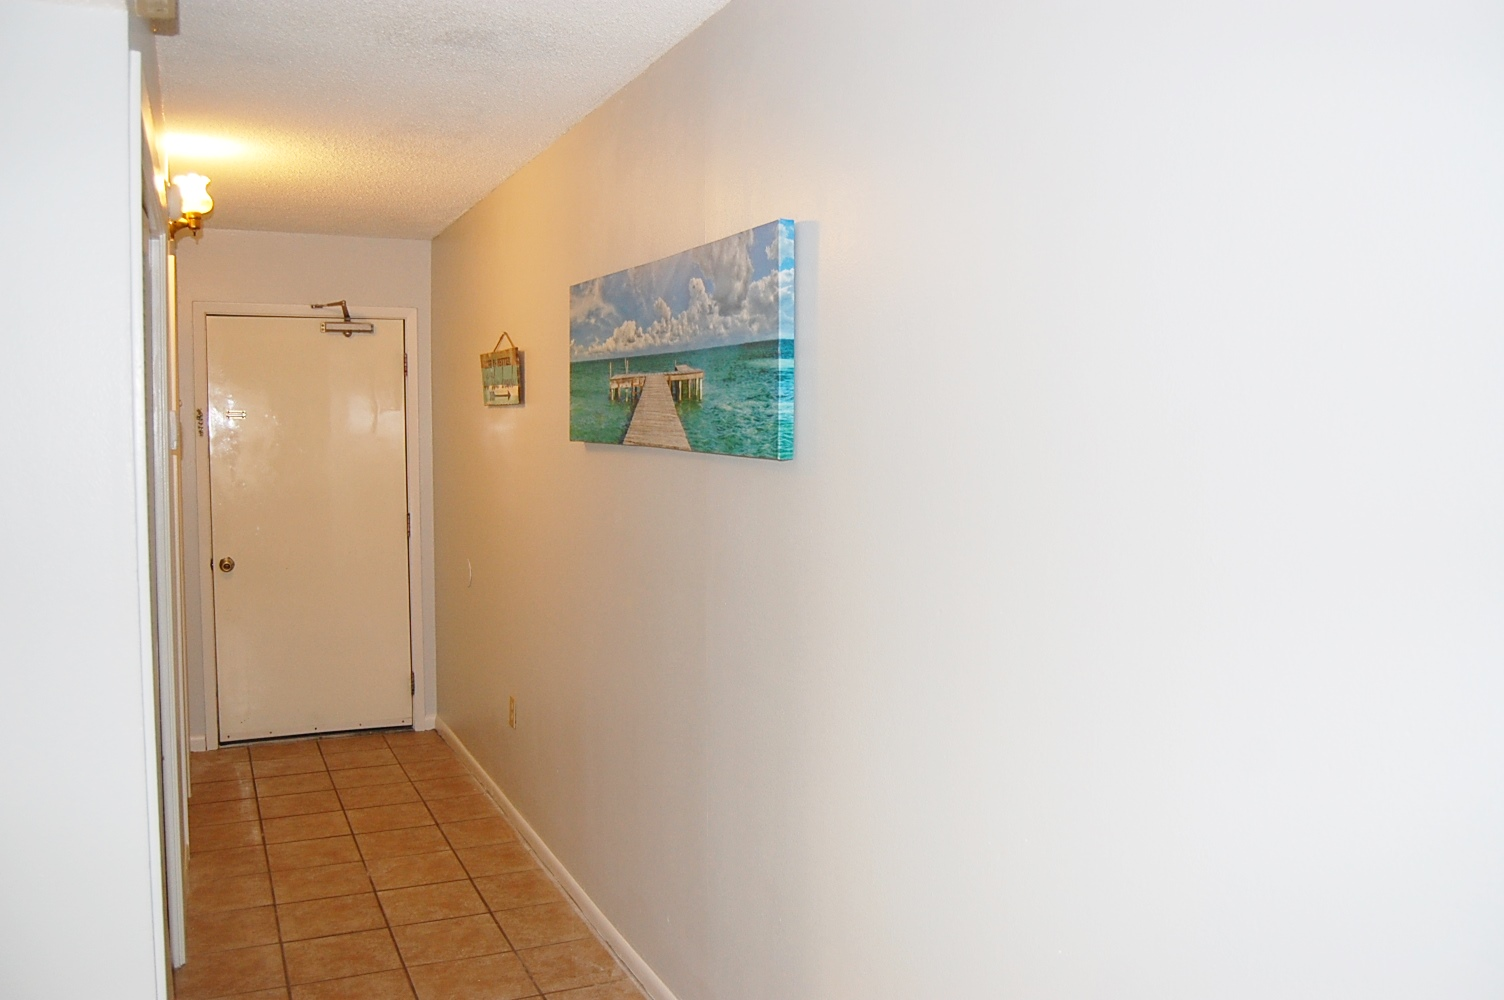 Island Sunrise 568 Condo rental in Island Sunrise Gulf Shores in Gulf Shores Alabama - #20